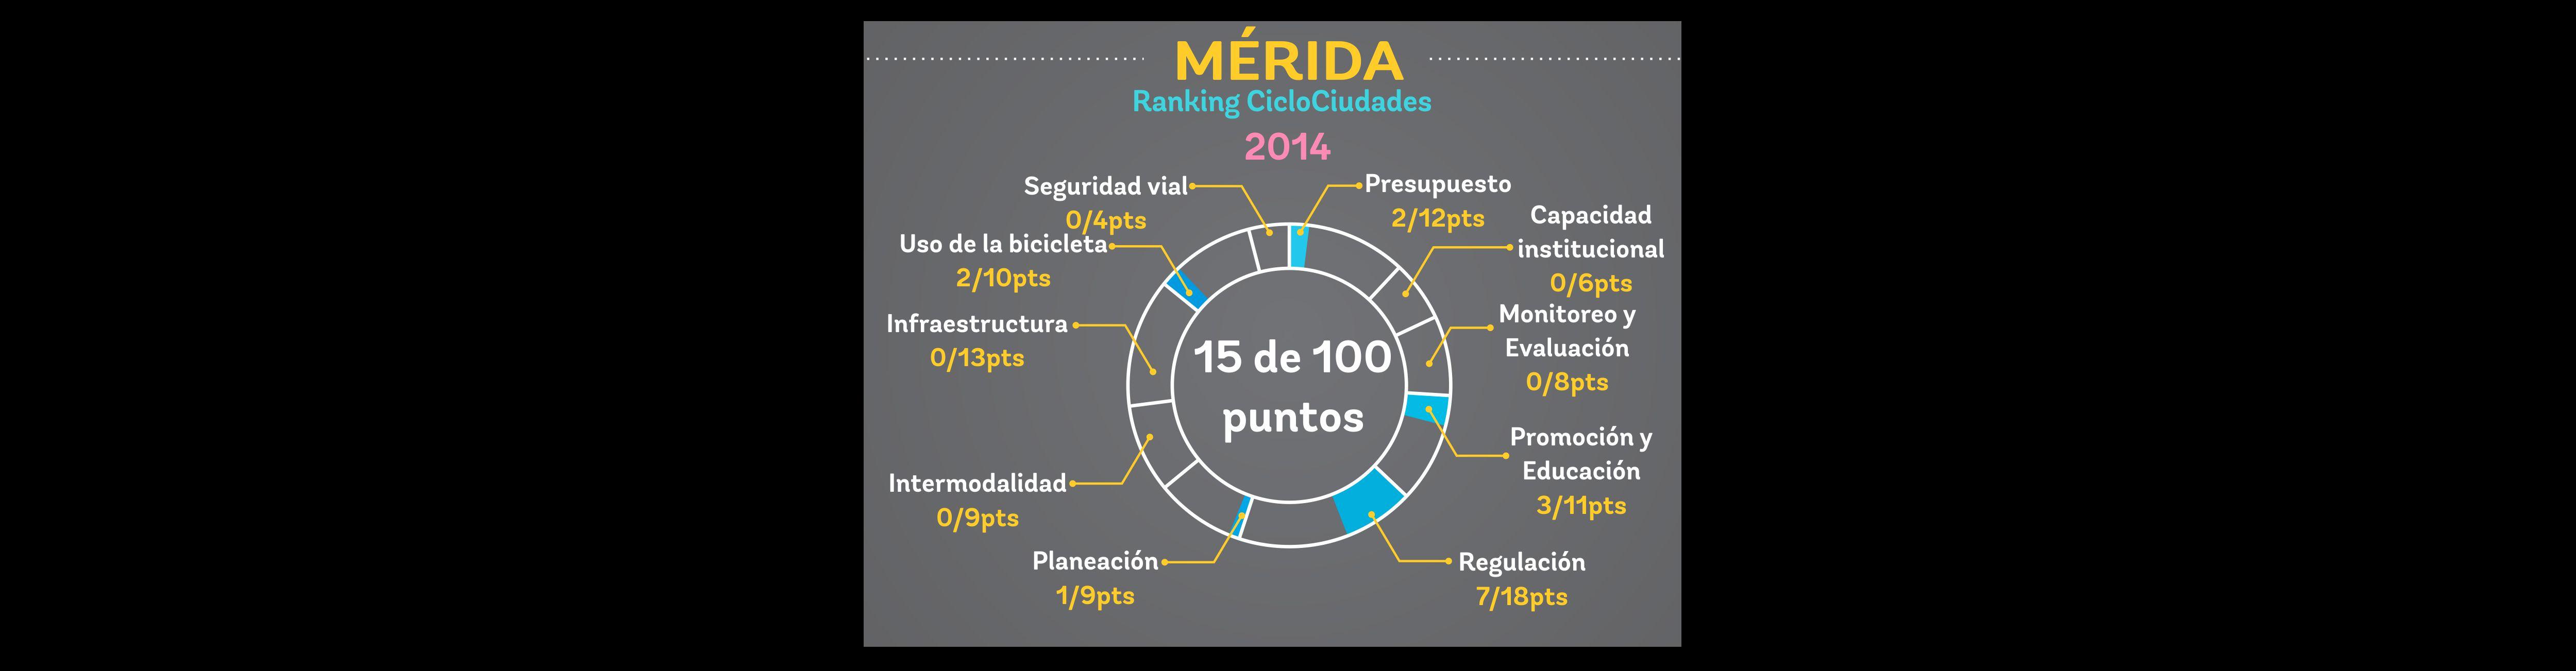 ranking_mérida